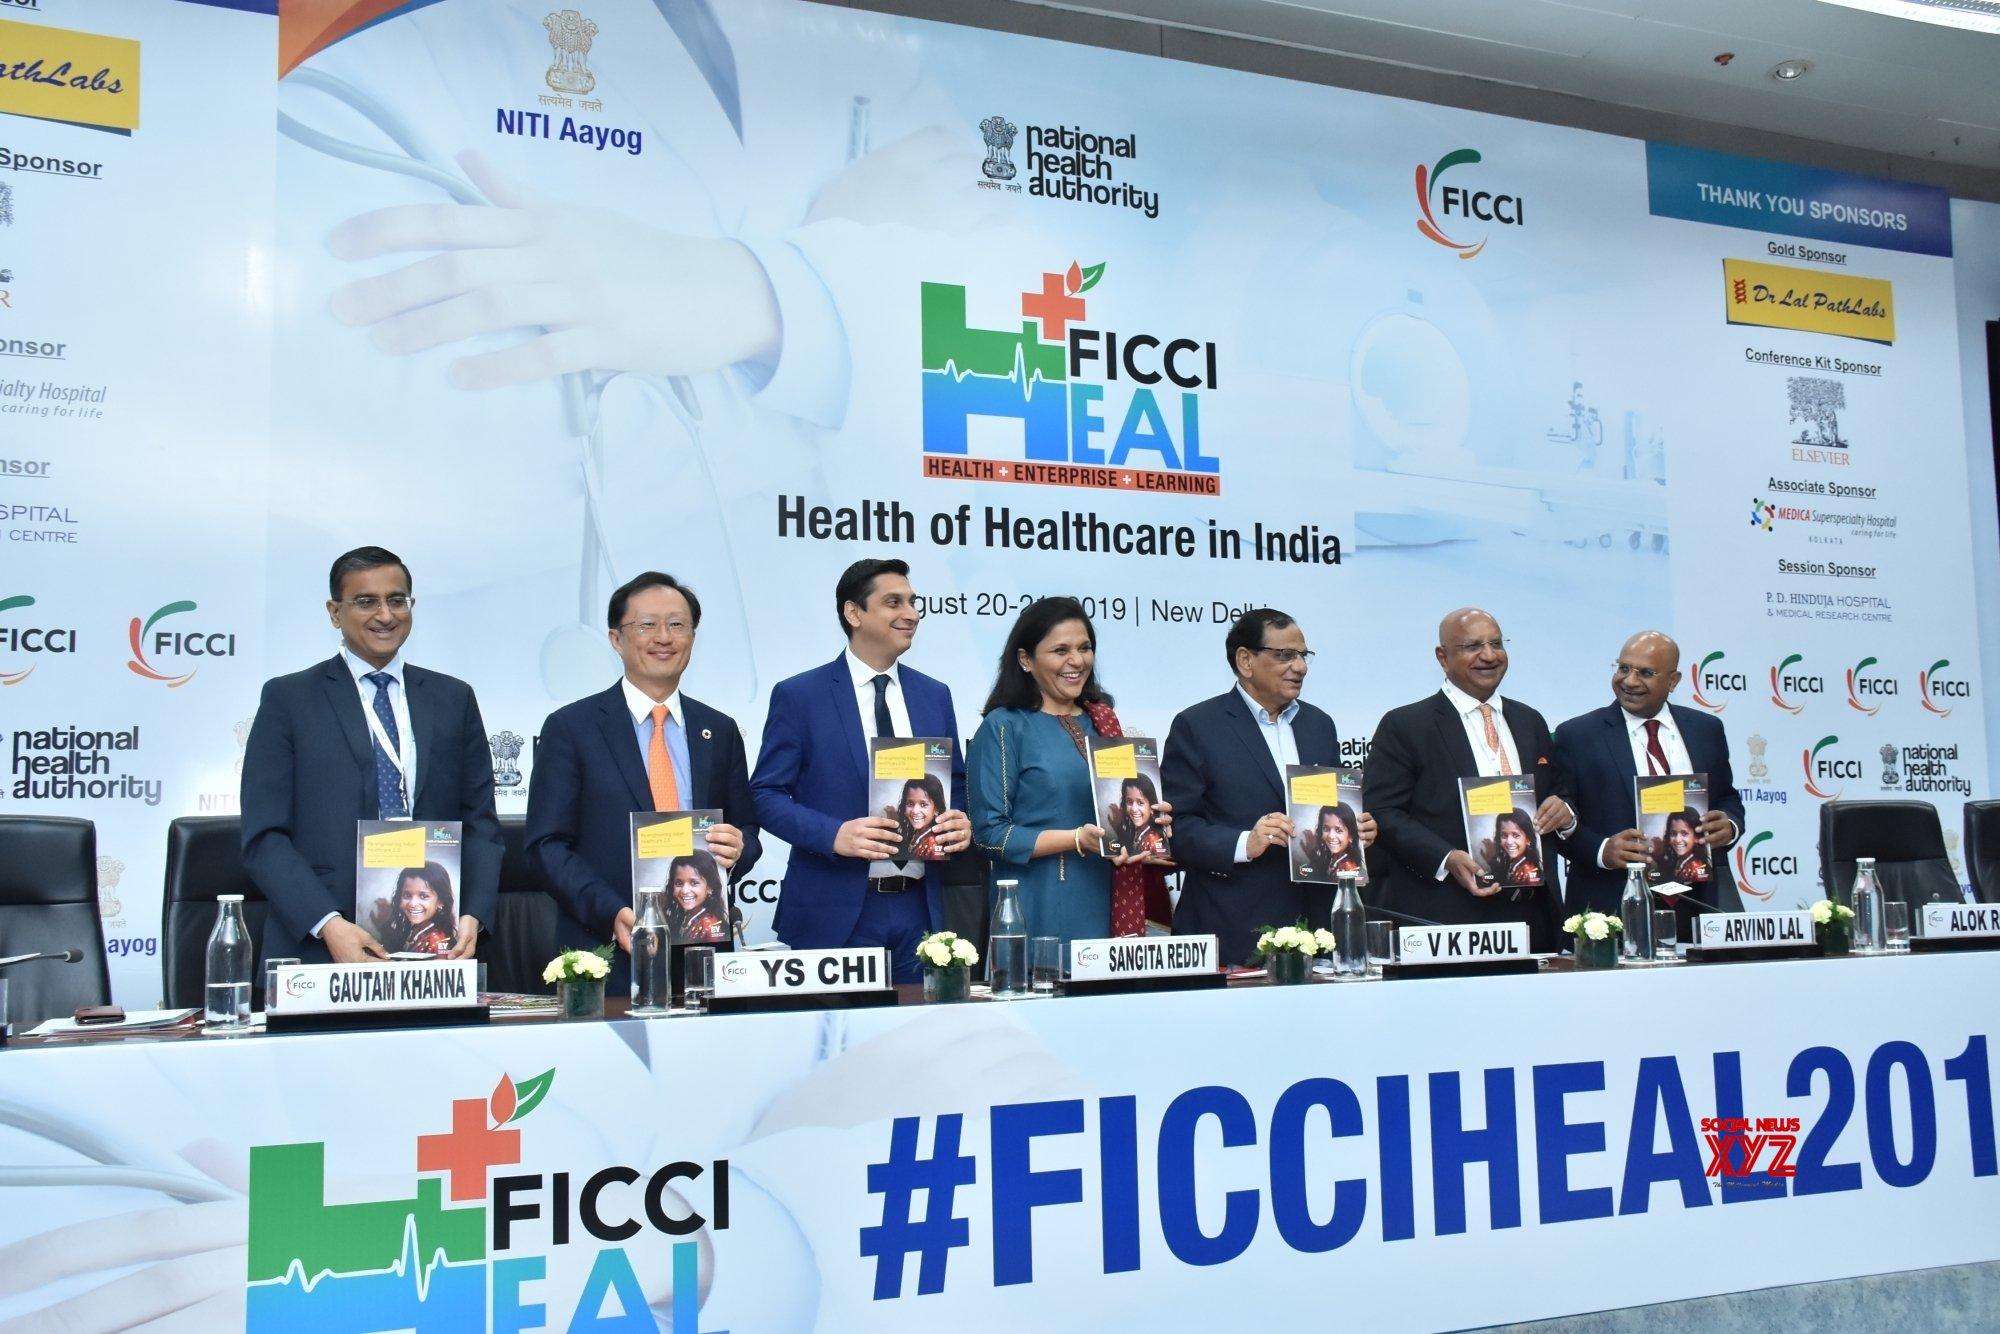 New Delhi: 'FICCI HEAL 2019 - Health of Healthcare in India' #Gallery